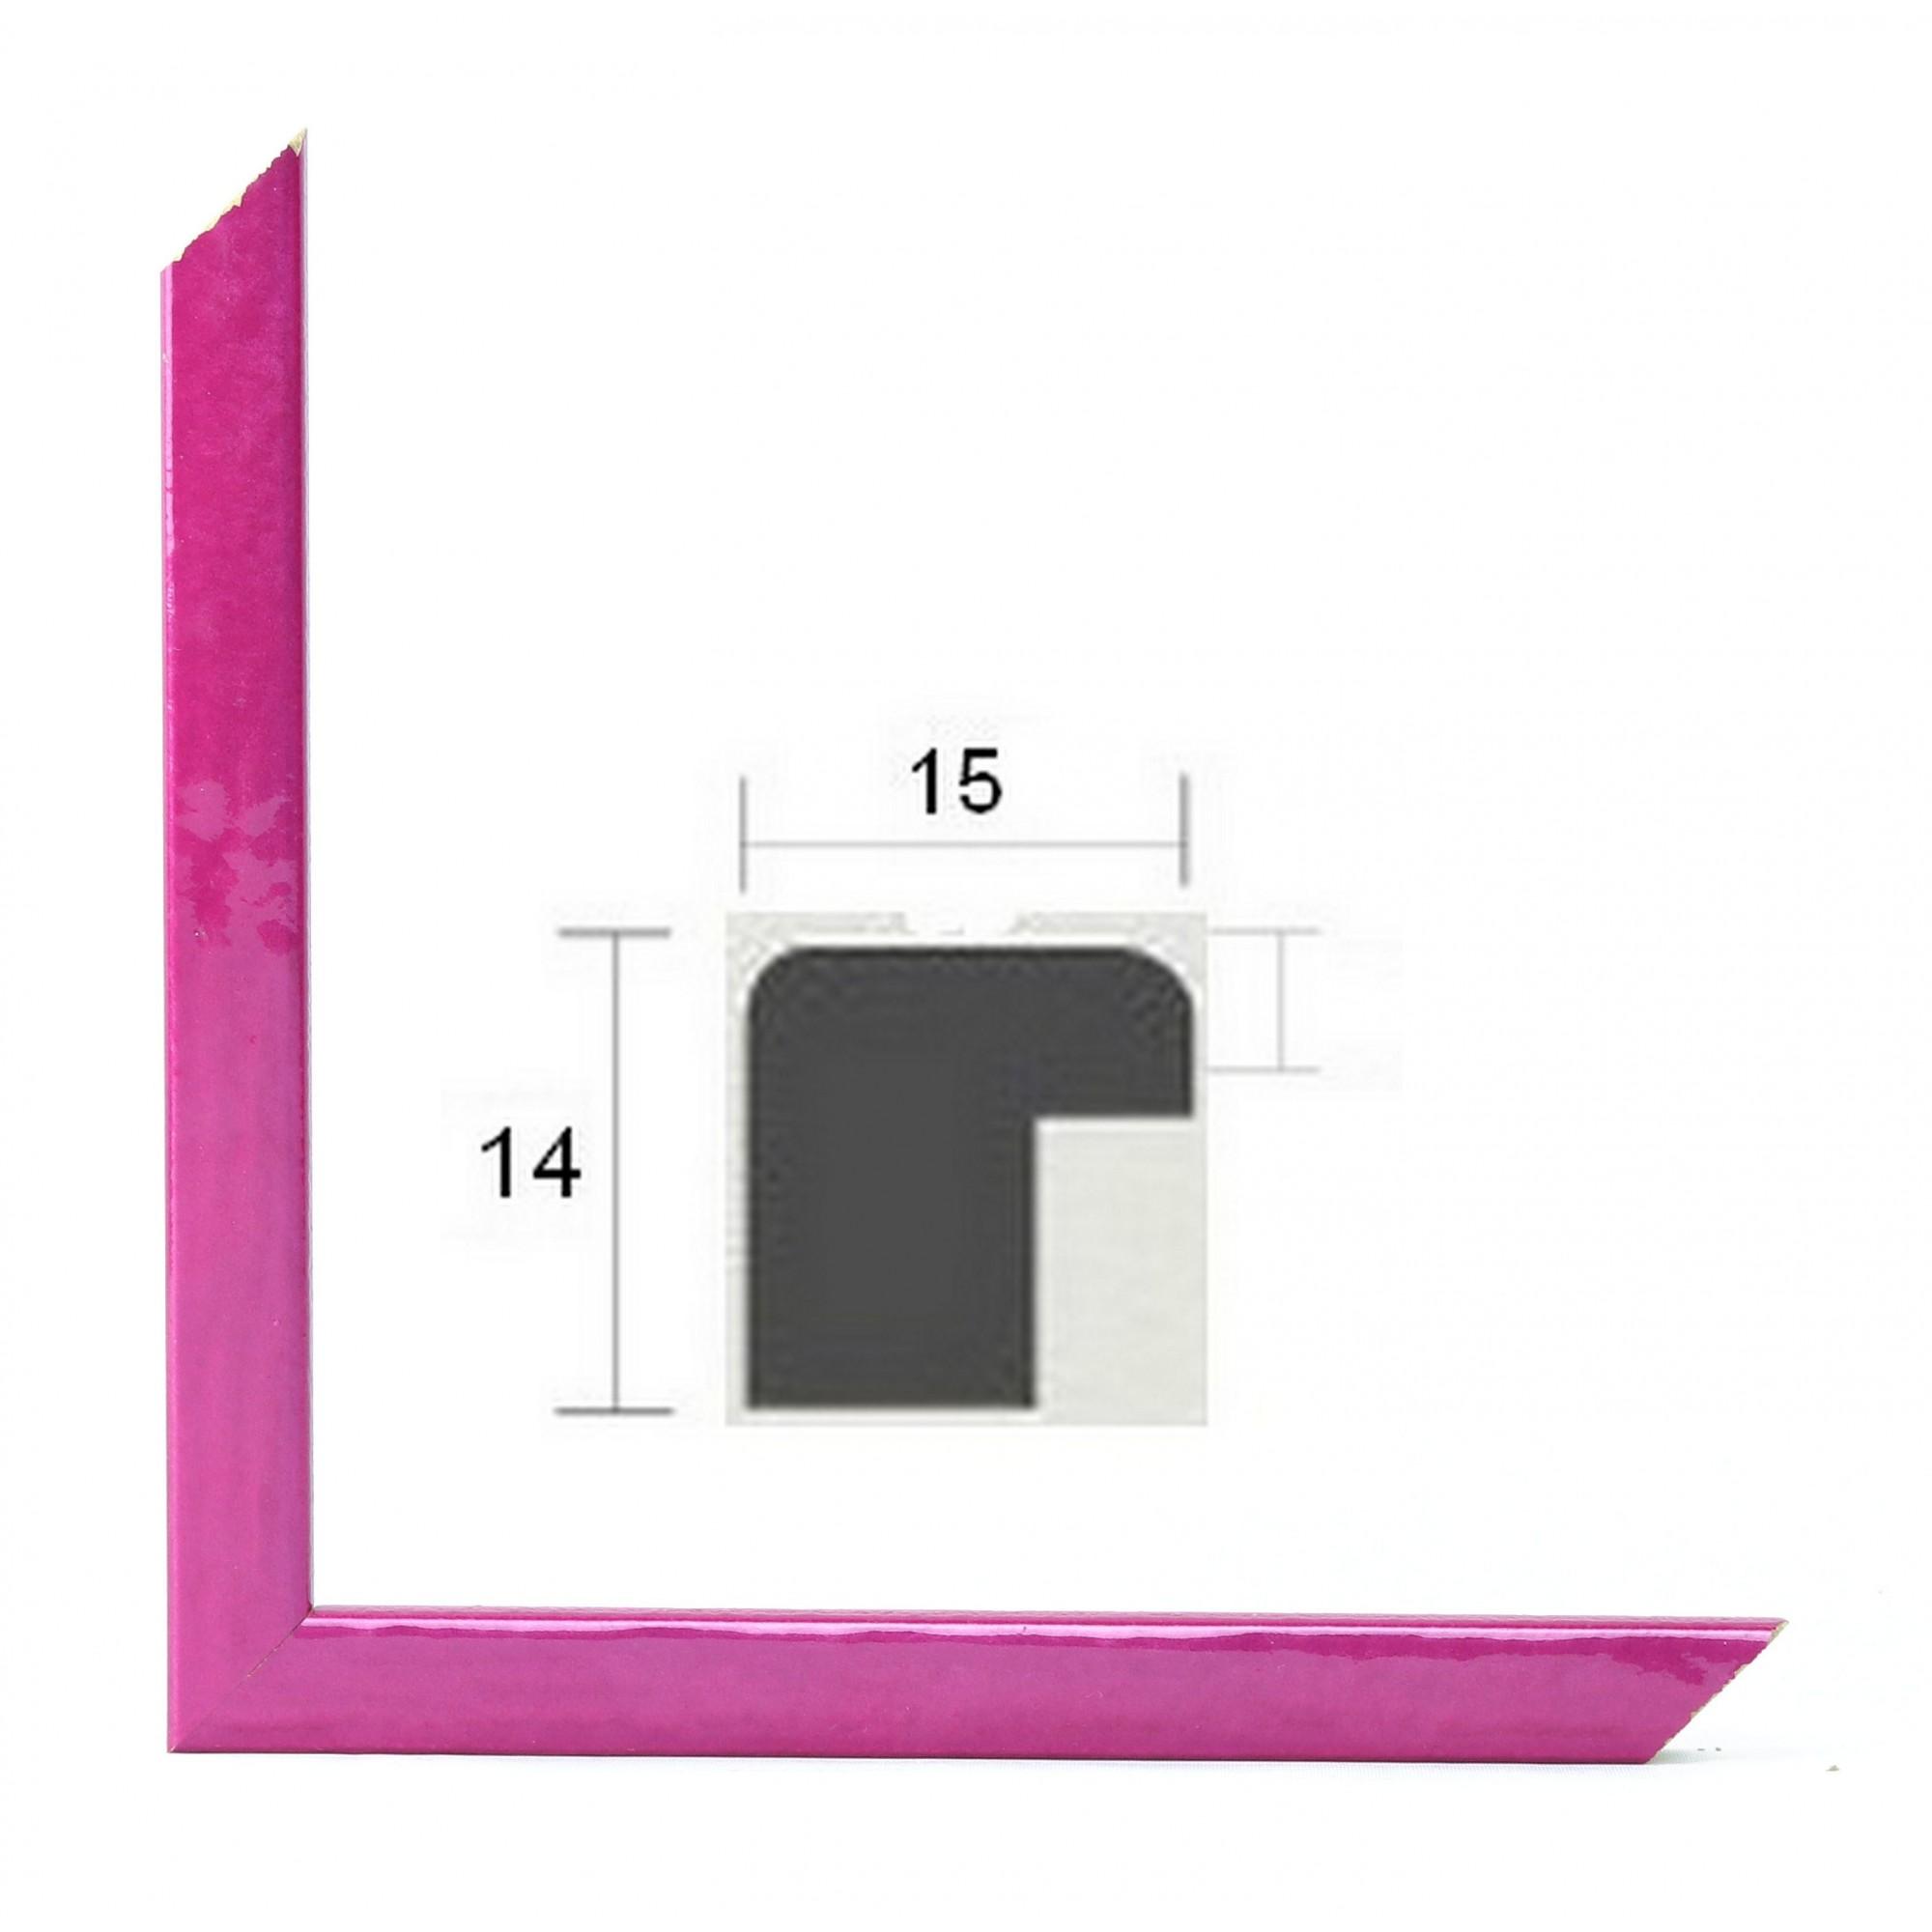 cadre photo sur mesure capri rose. Black Bedroom Furniture Sets. Home Design Ideas